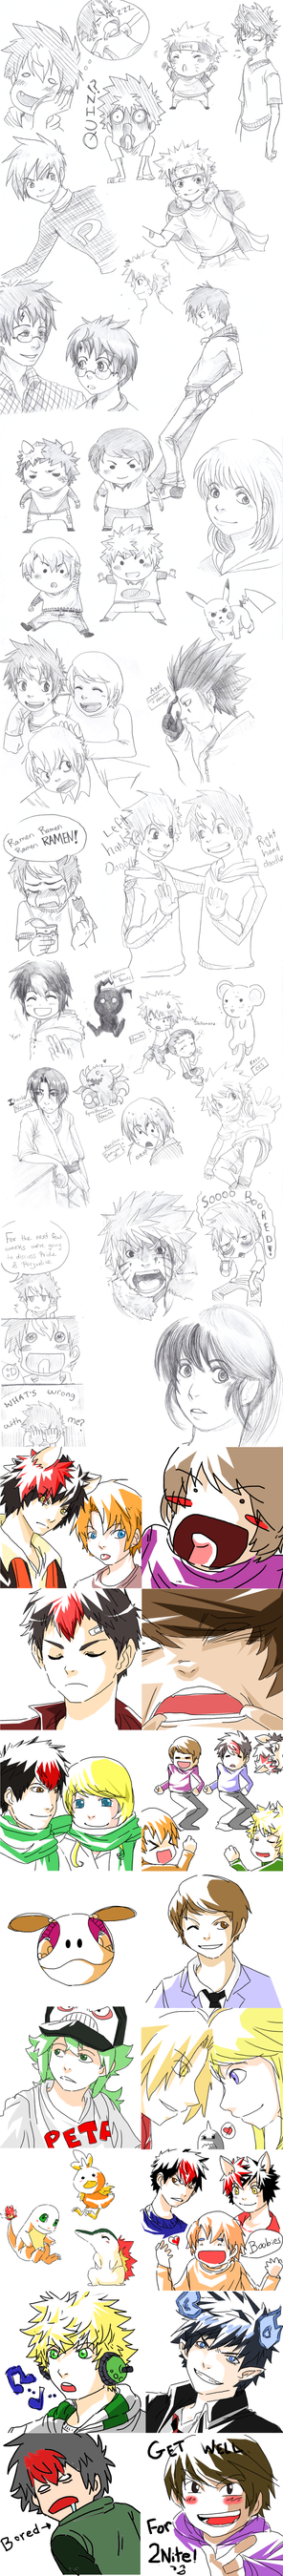 Sketch Dump Returns by AmukaUroy